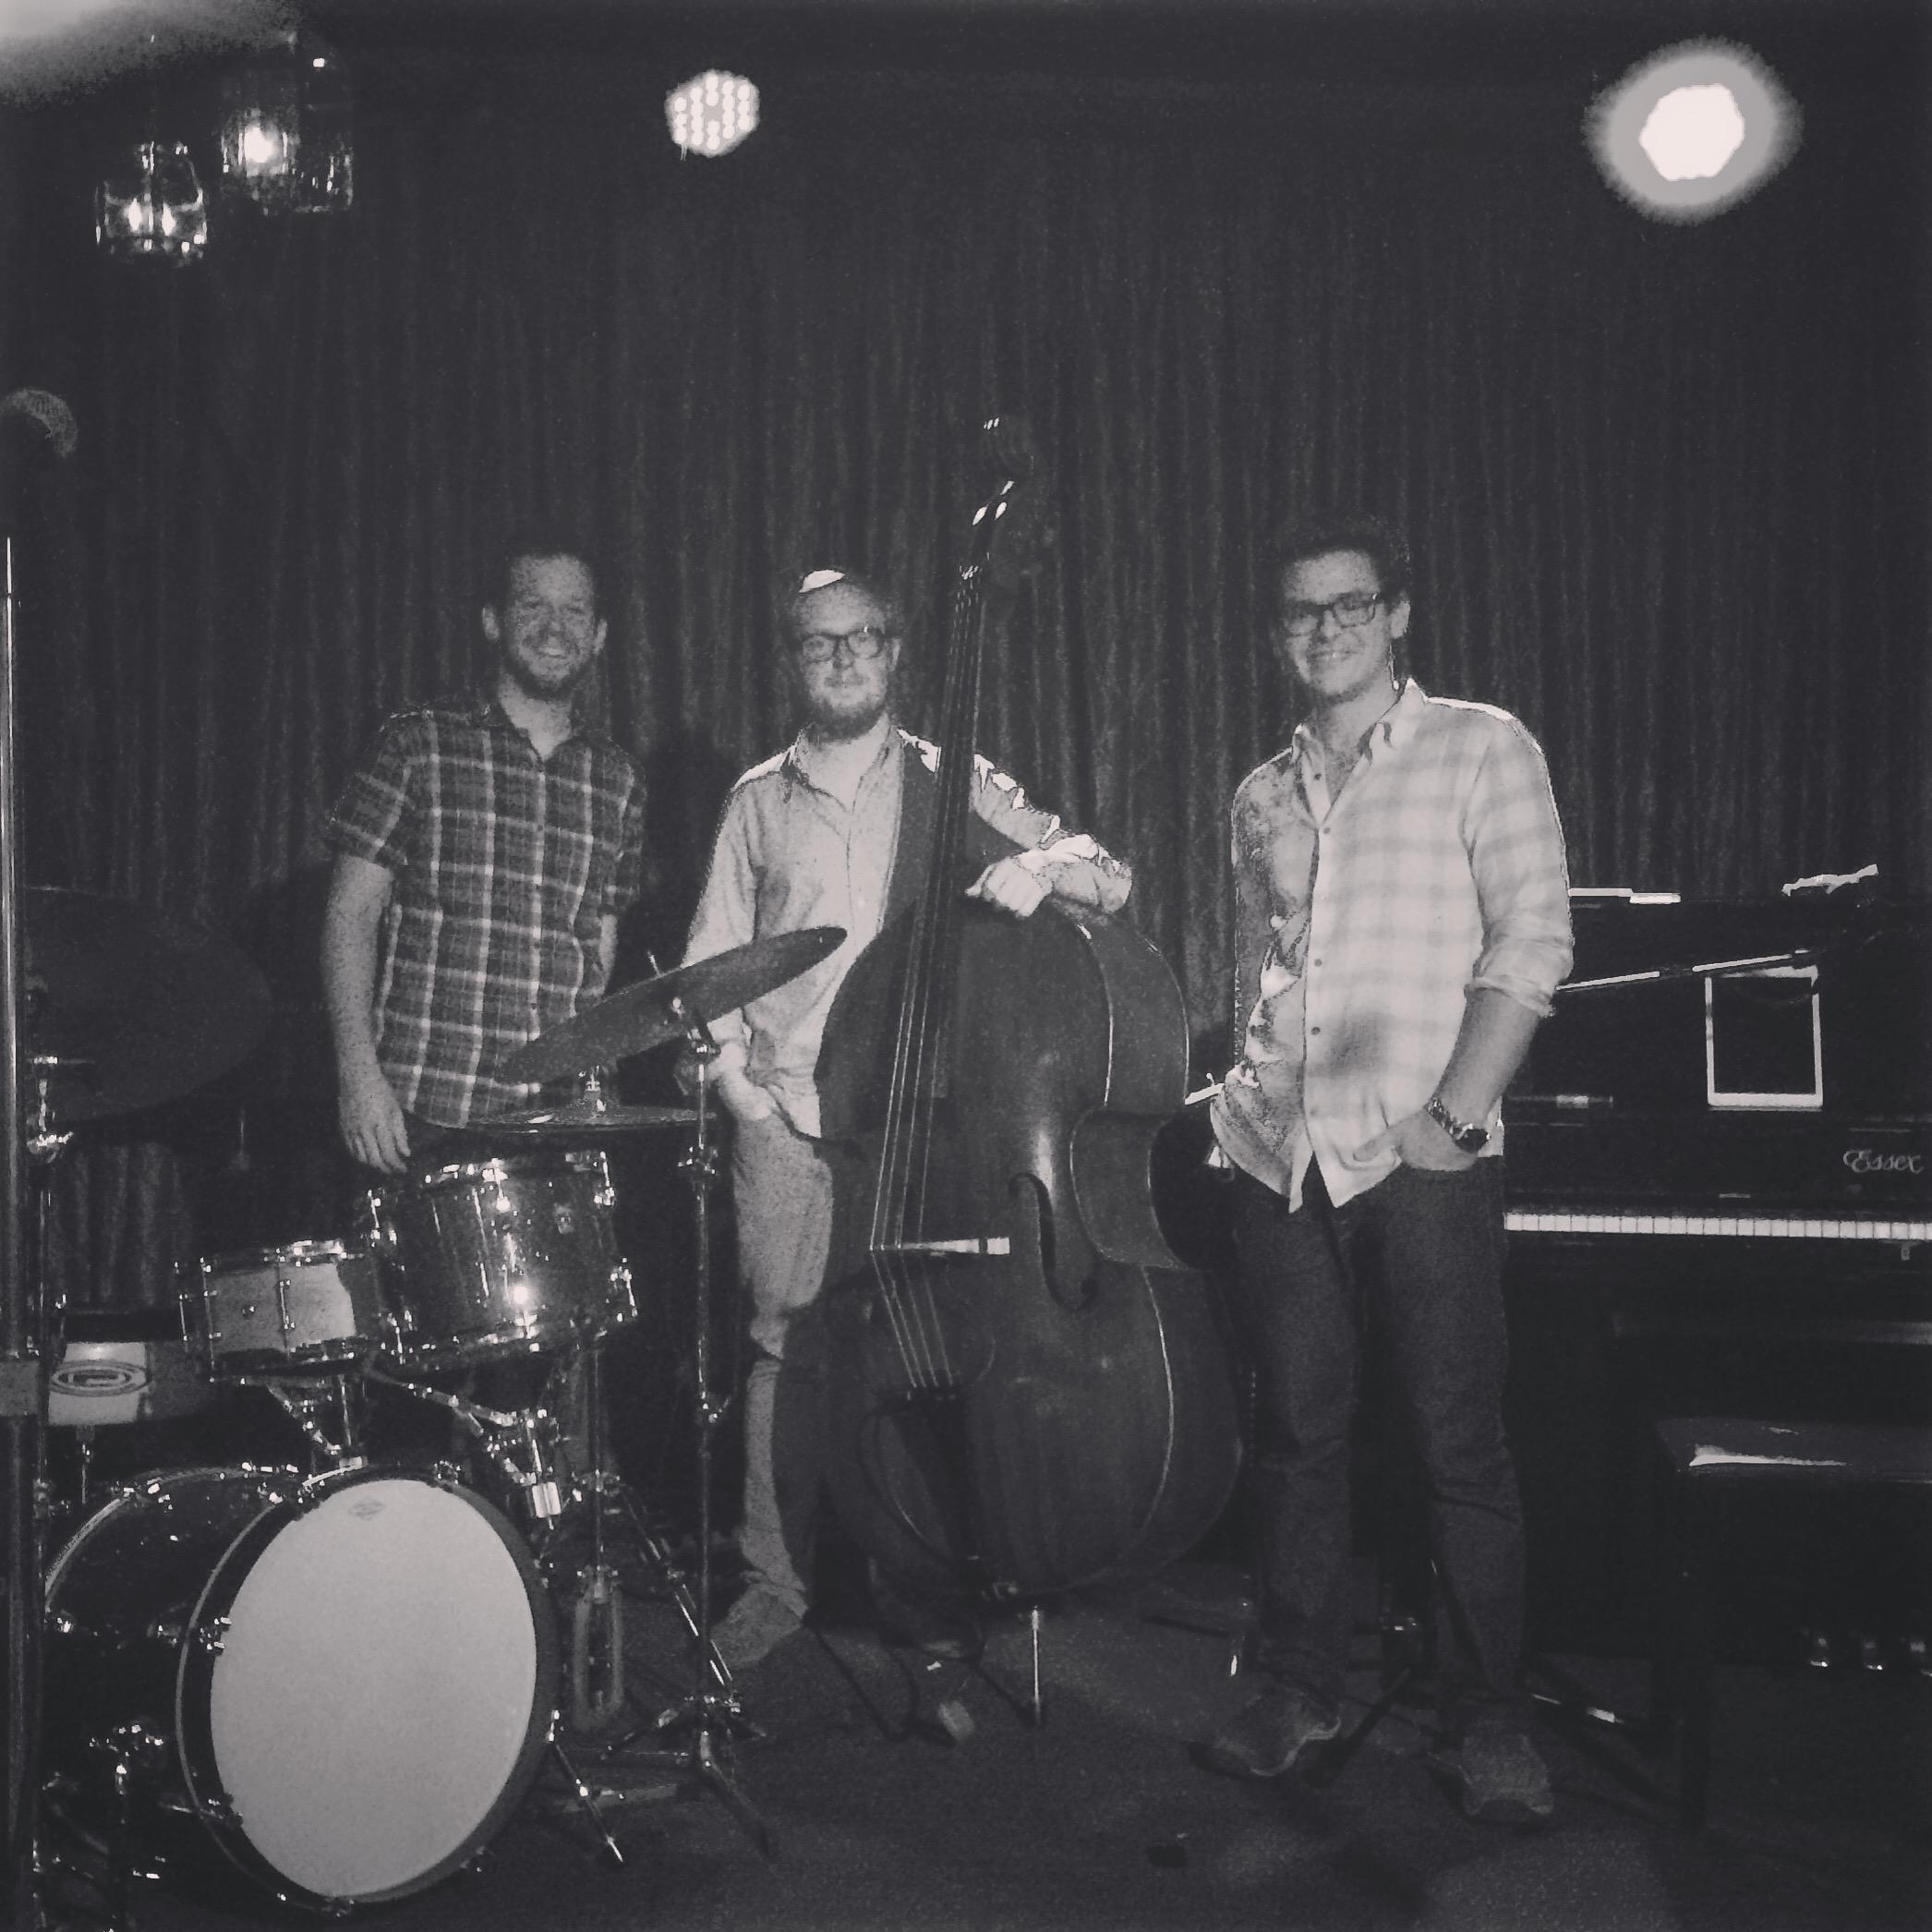 Gianni Bianchini Trio